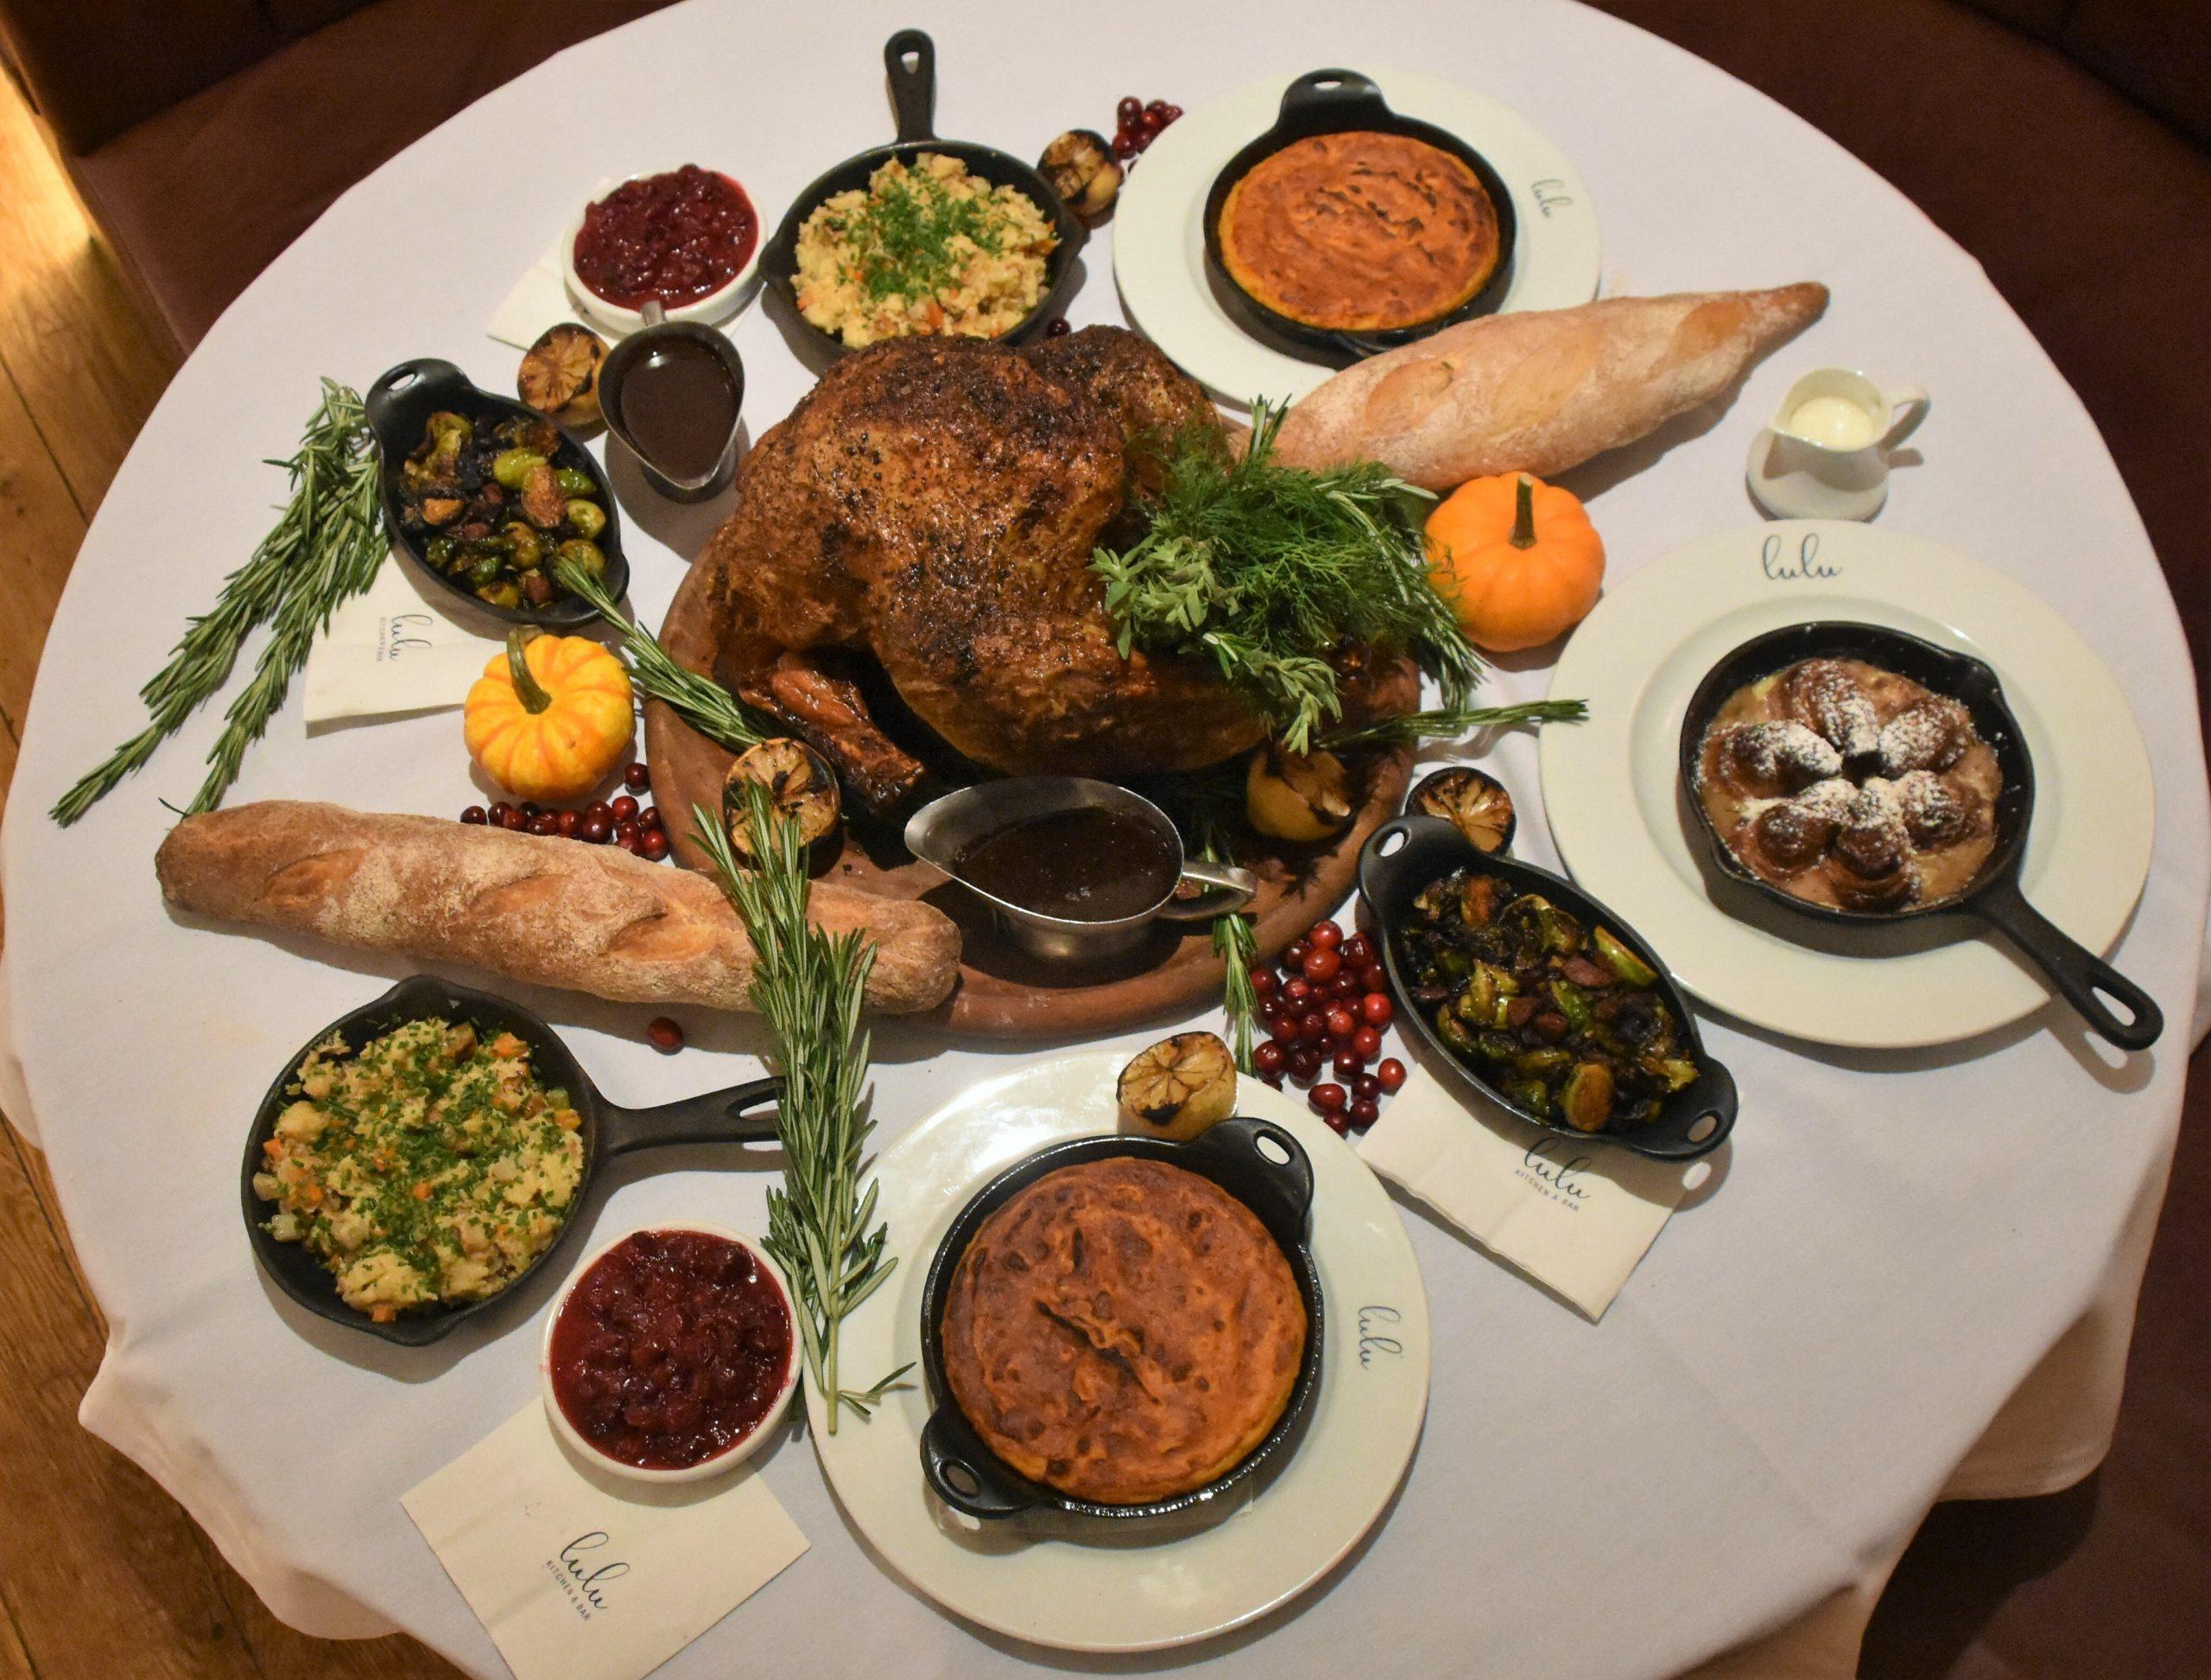 Lulu's Thanksgiving spread.